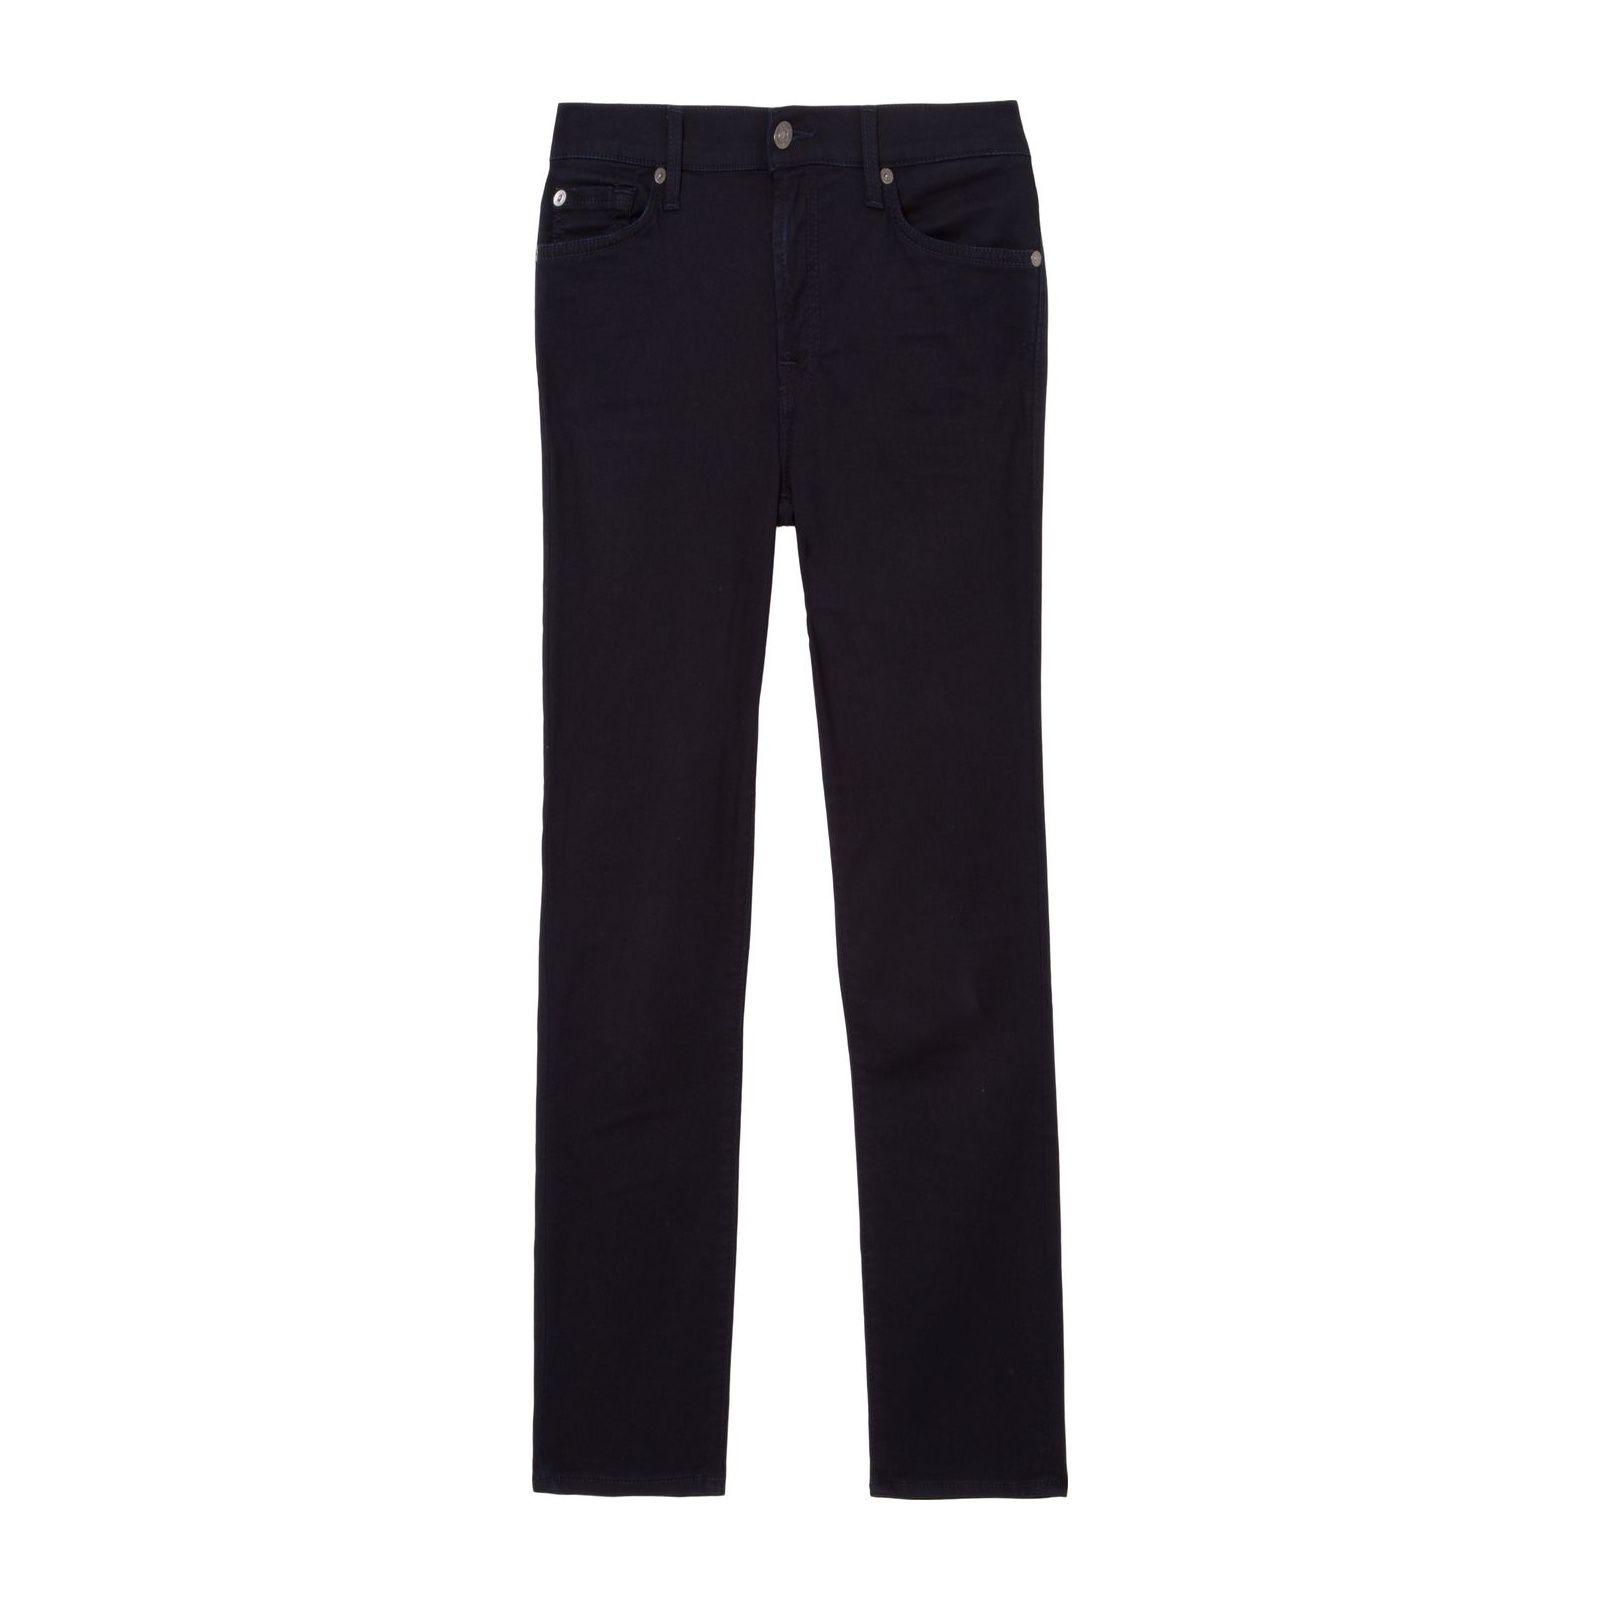 Calça Jeans Capri Tonal Featherweight